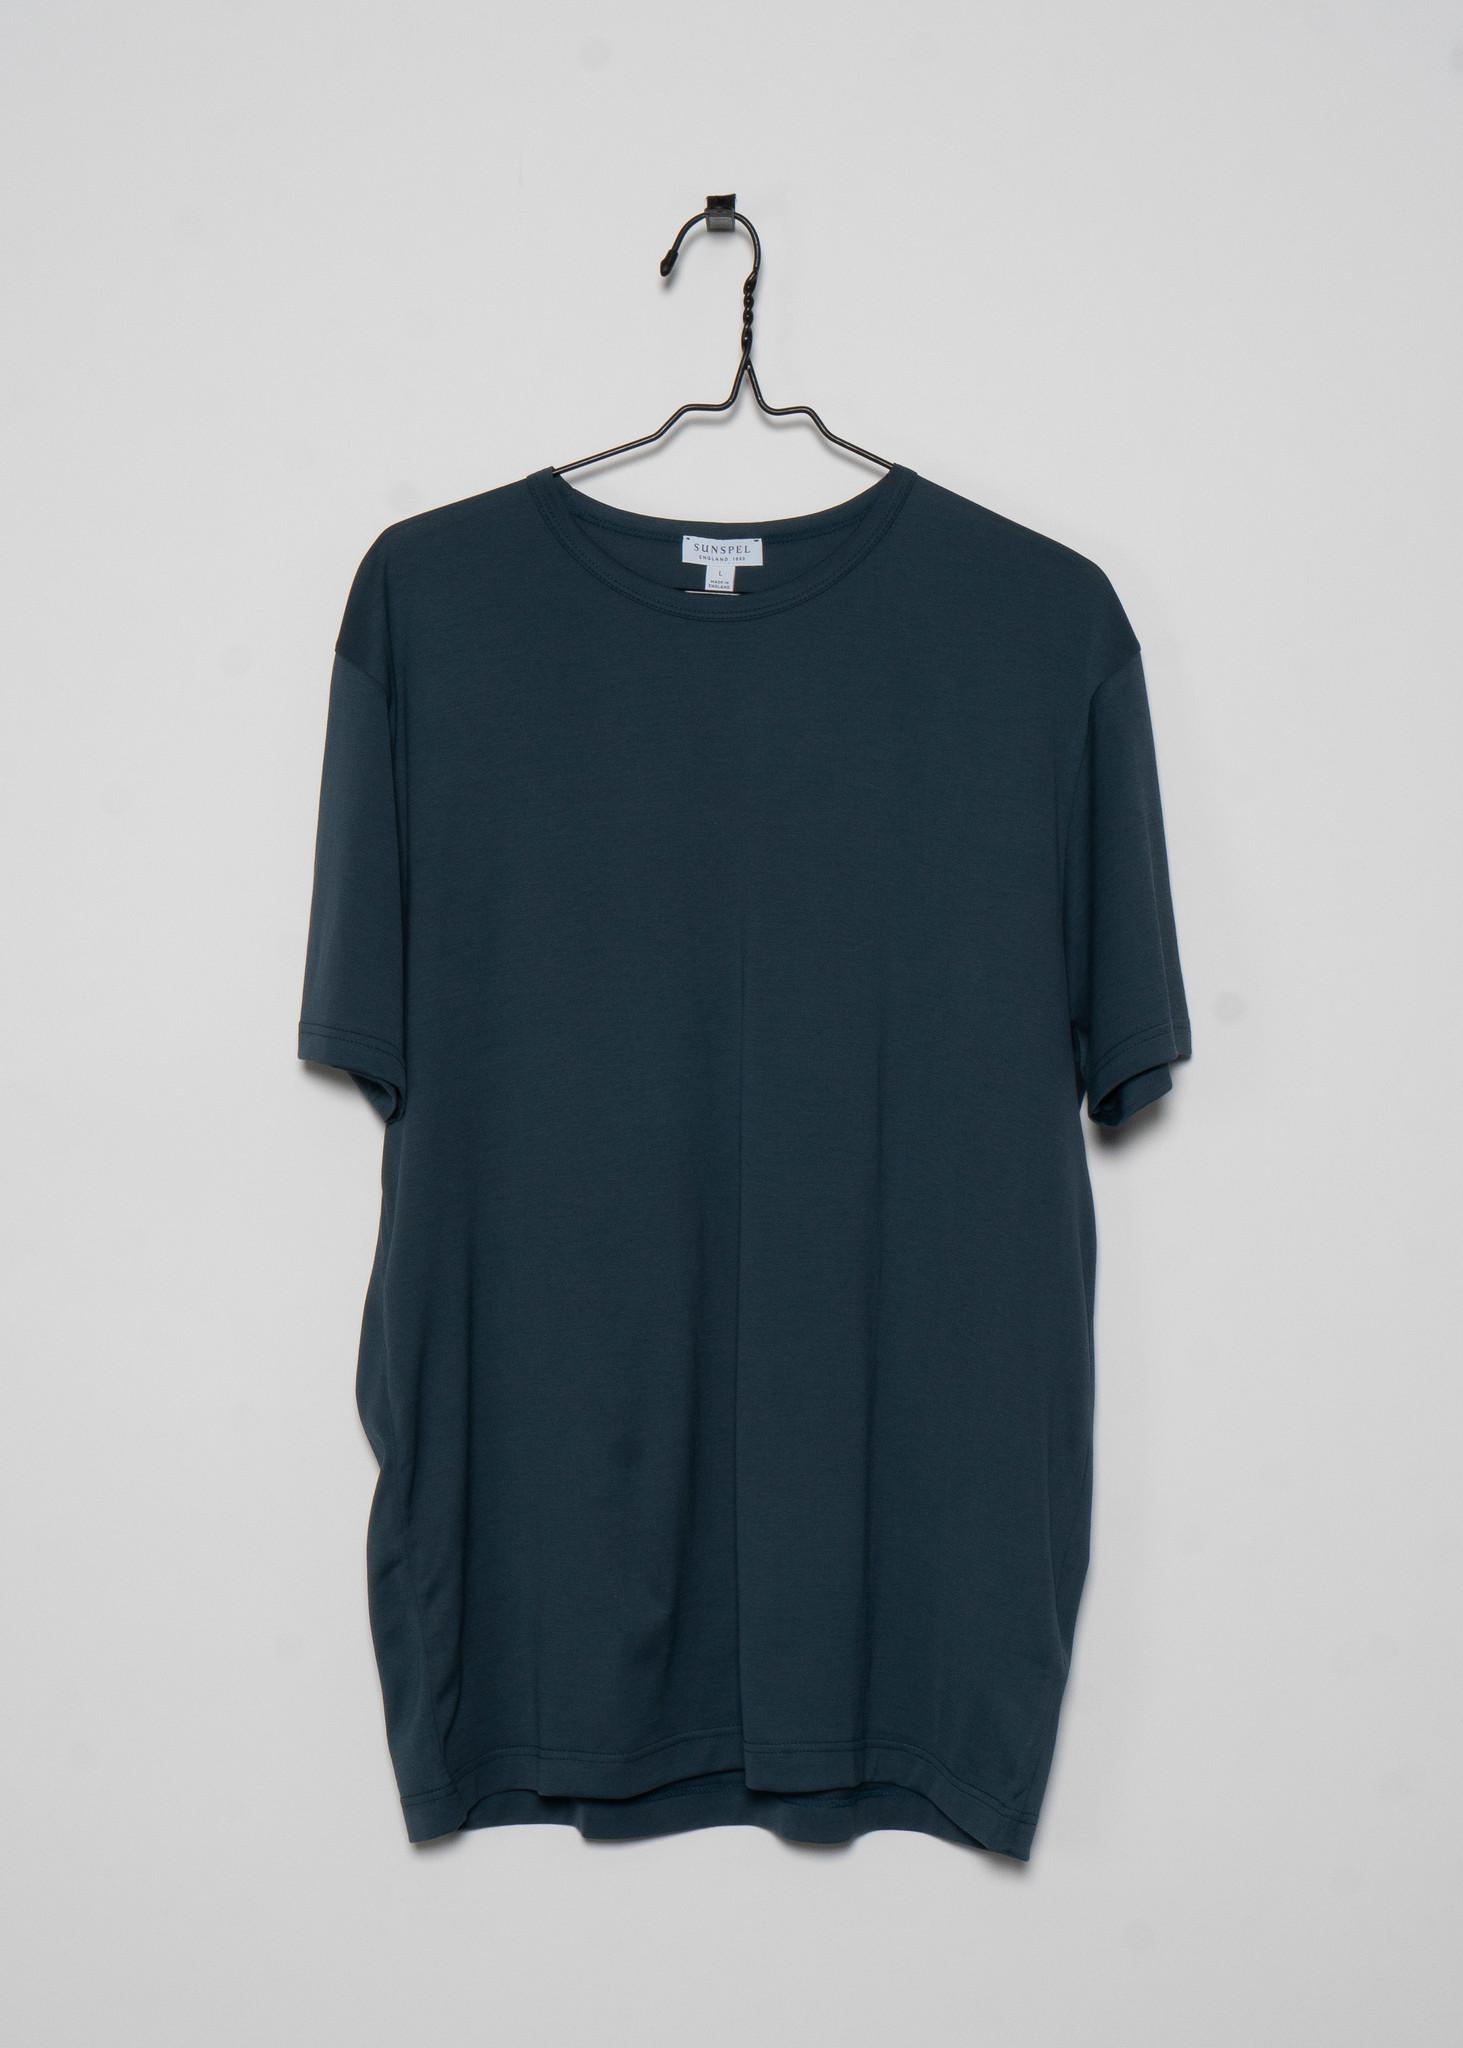 Petrol Green Crewneck T-Shirt